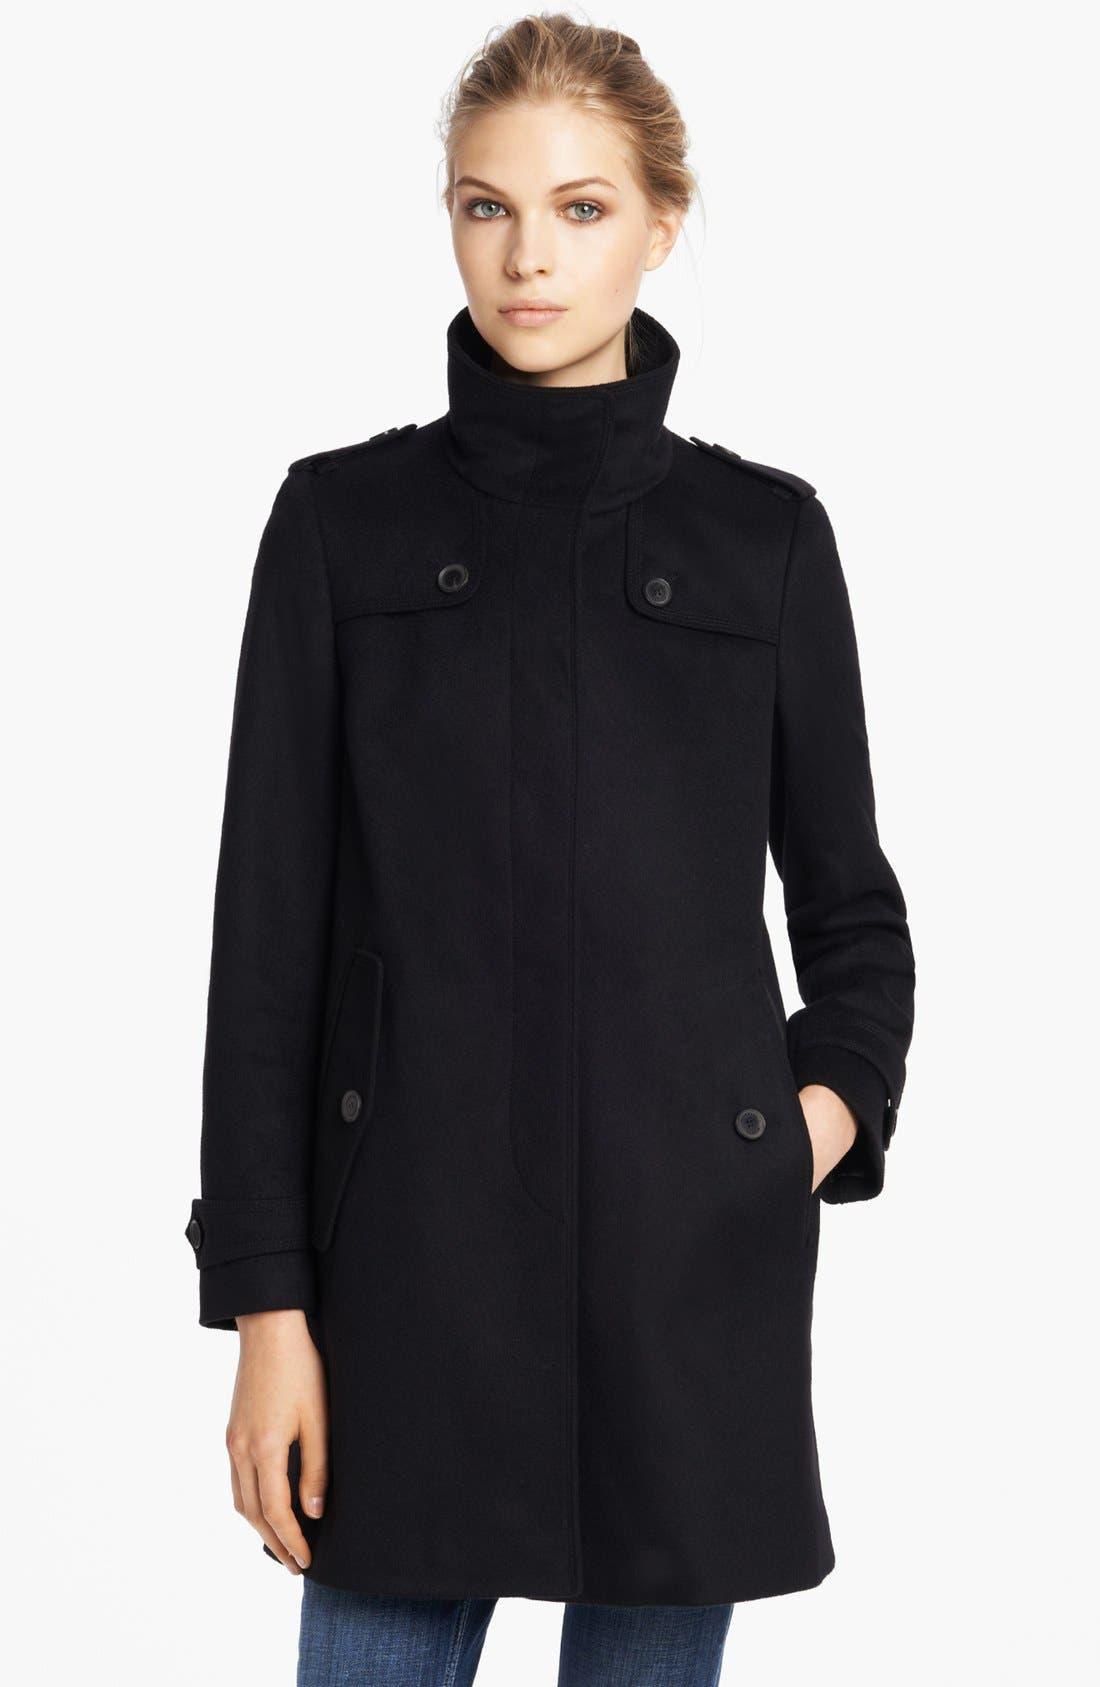 Main Image - Burberry London Wool & Cashmere Caban Coat